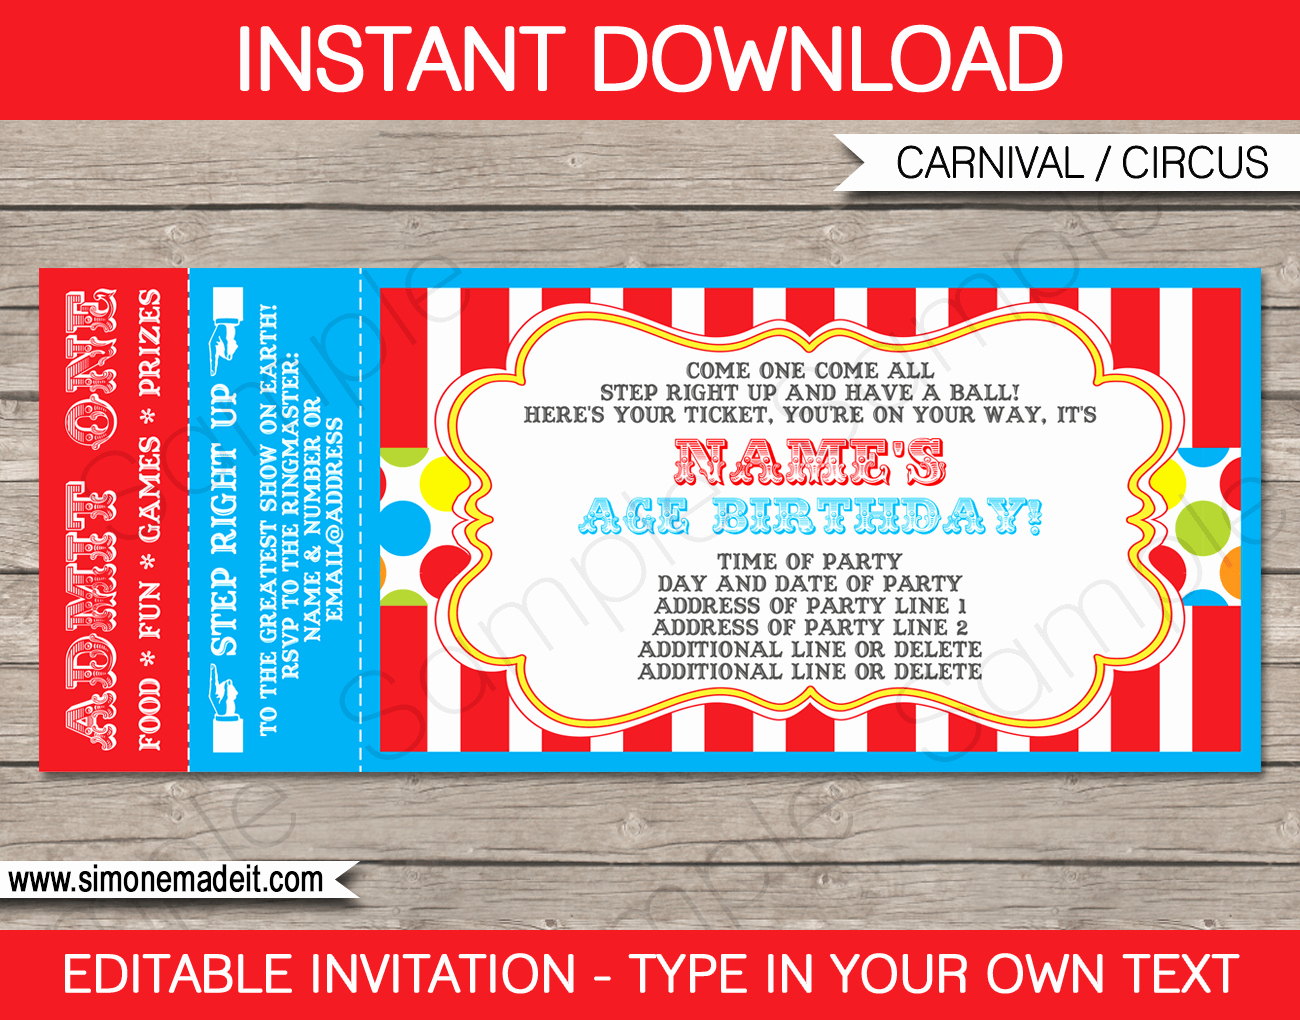 Carnival Ticket Invitation Template Free Beautiful Carnival Ticket Invitation Template